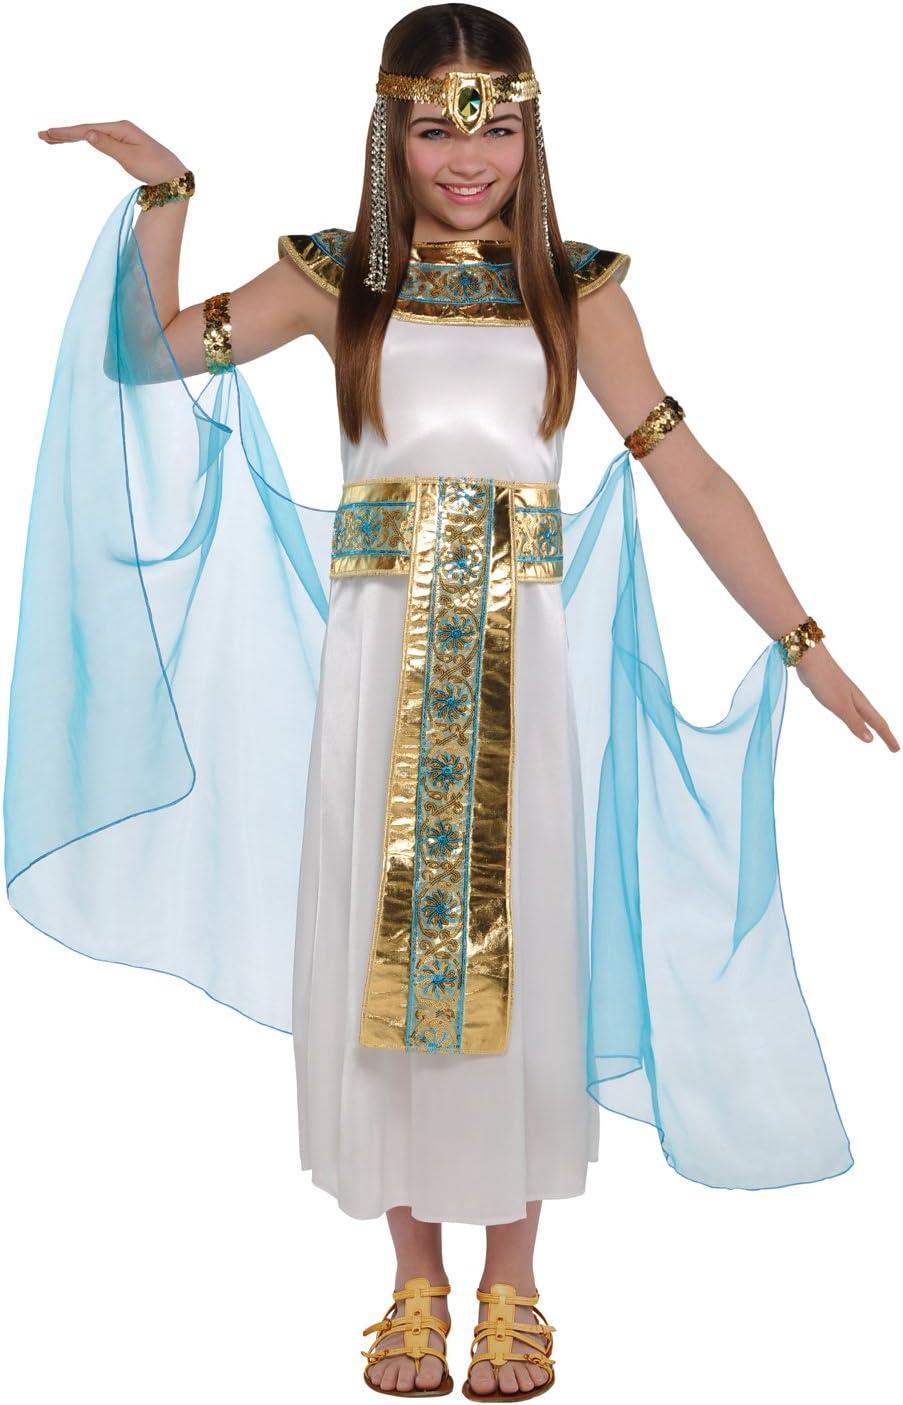 Donne Capelli DECOR EGIZIANA CON PERLINE HEADDRESS CLEOPATRA Bracciale Fancy Dress Costume